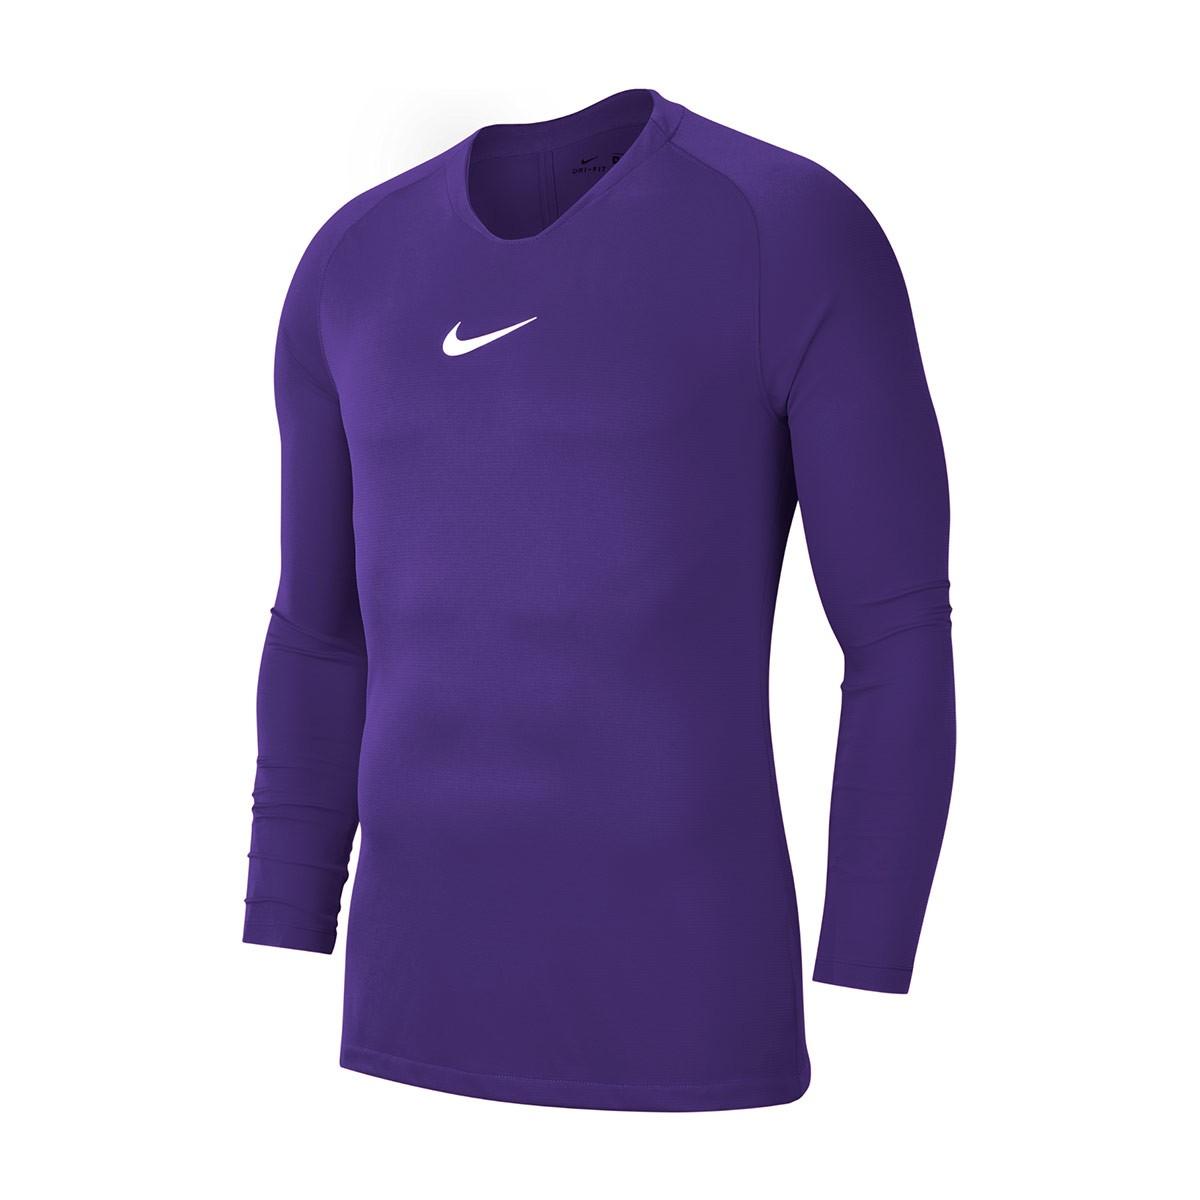 Jersey Nike Kids Park First Layer m l Court purple - Football store ... 806dac106